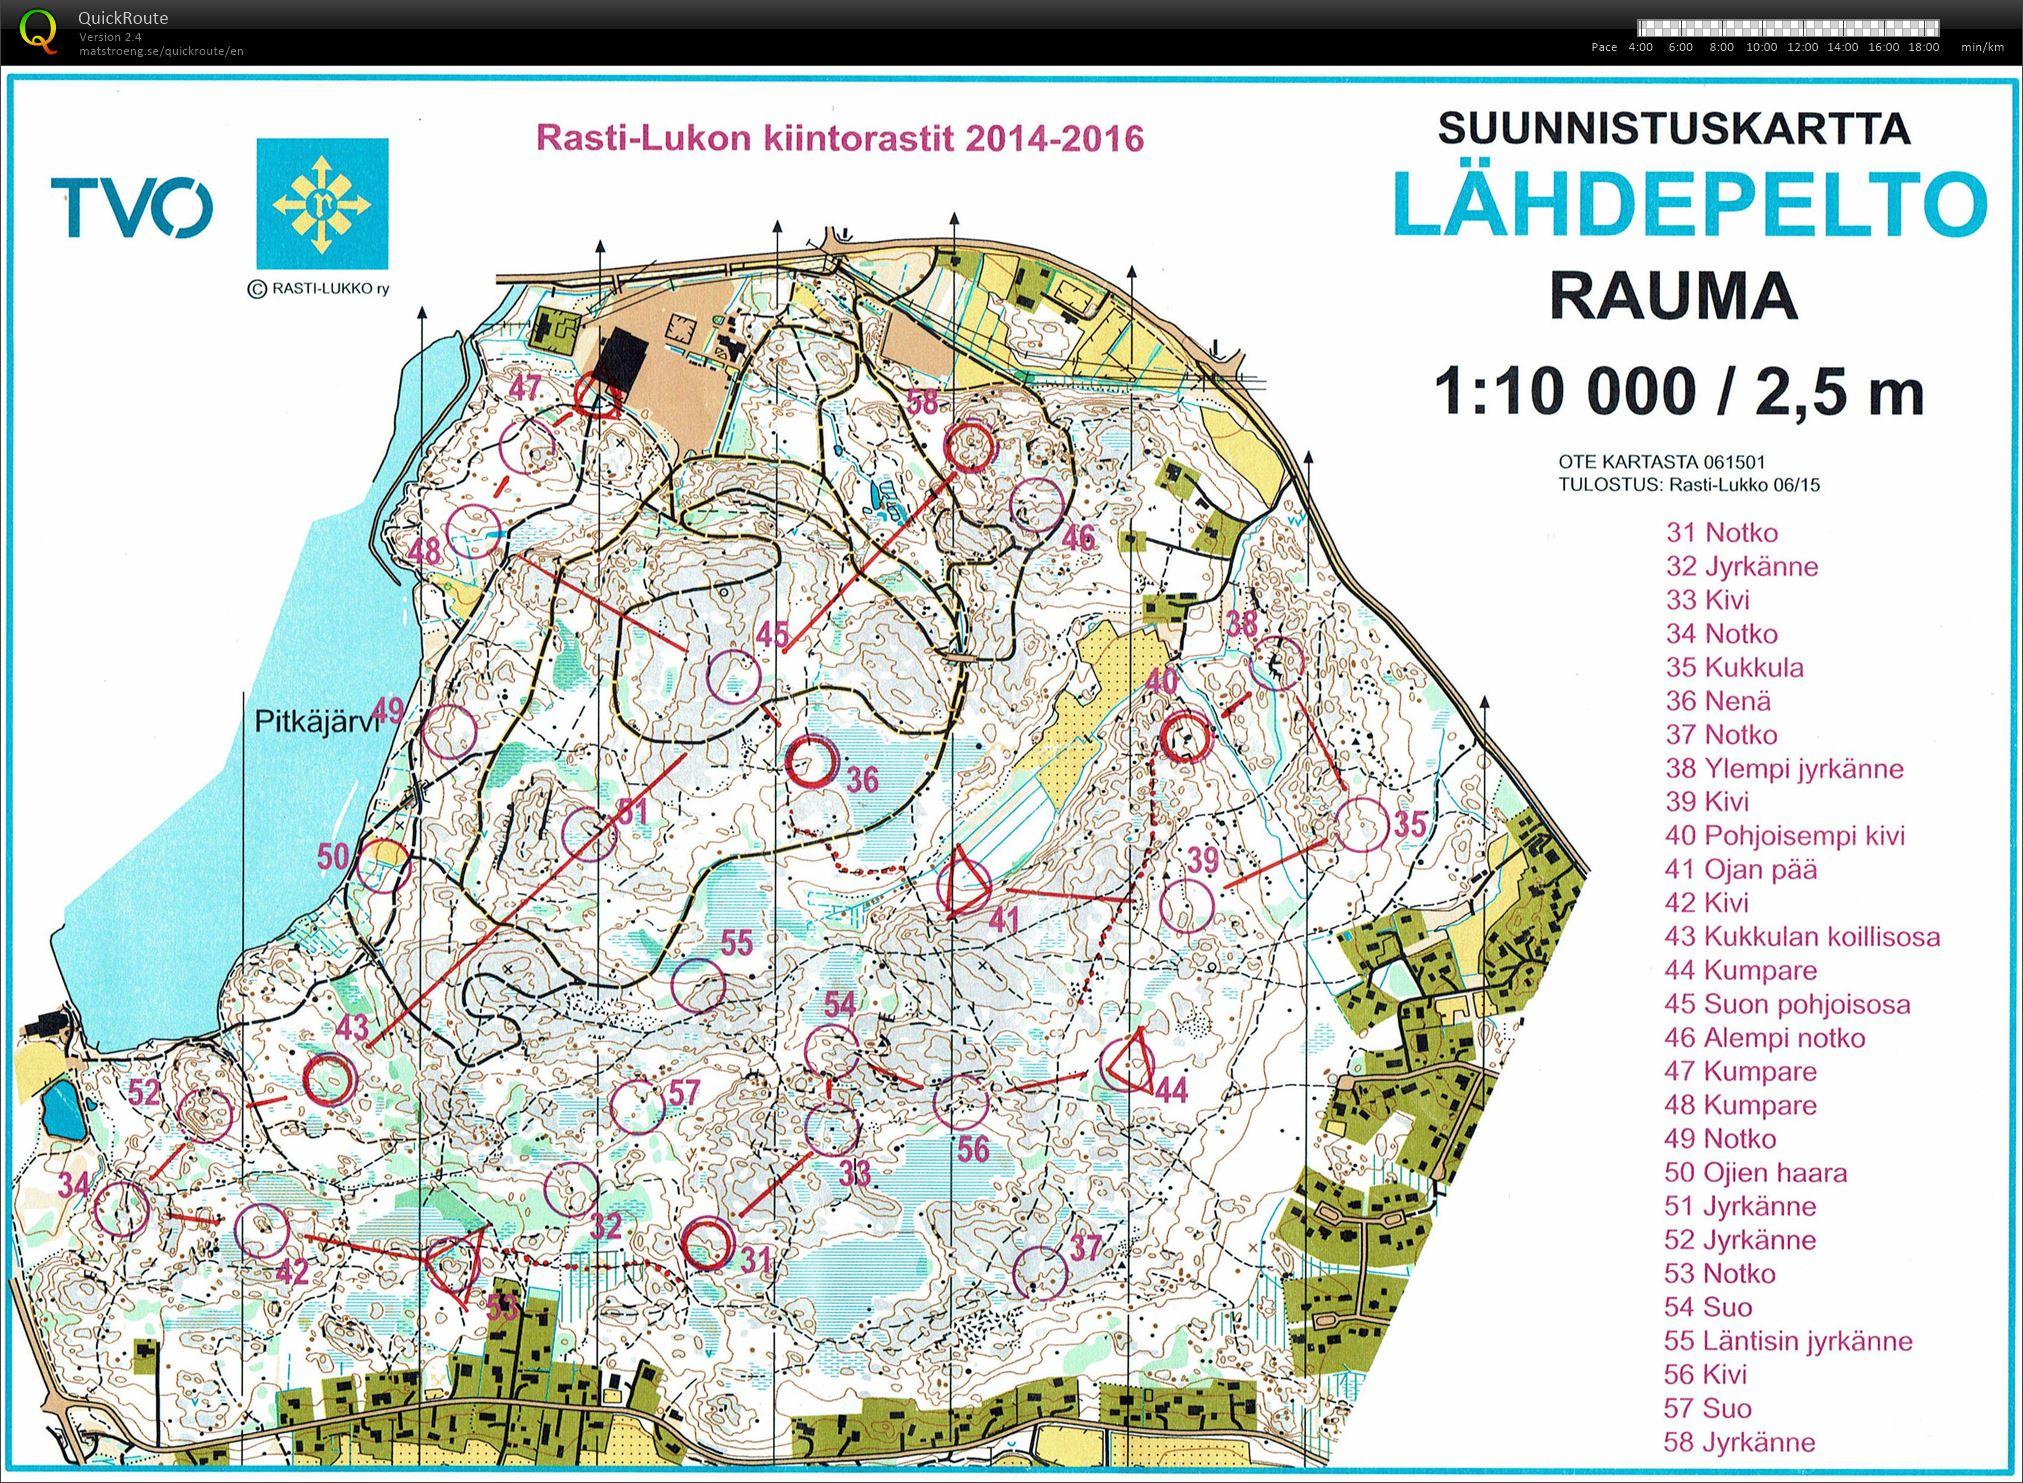 Training Rauma June 9th 2015 Orienteering Map from Markus Plohn